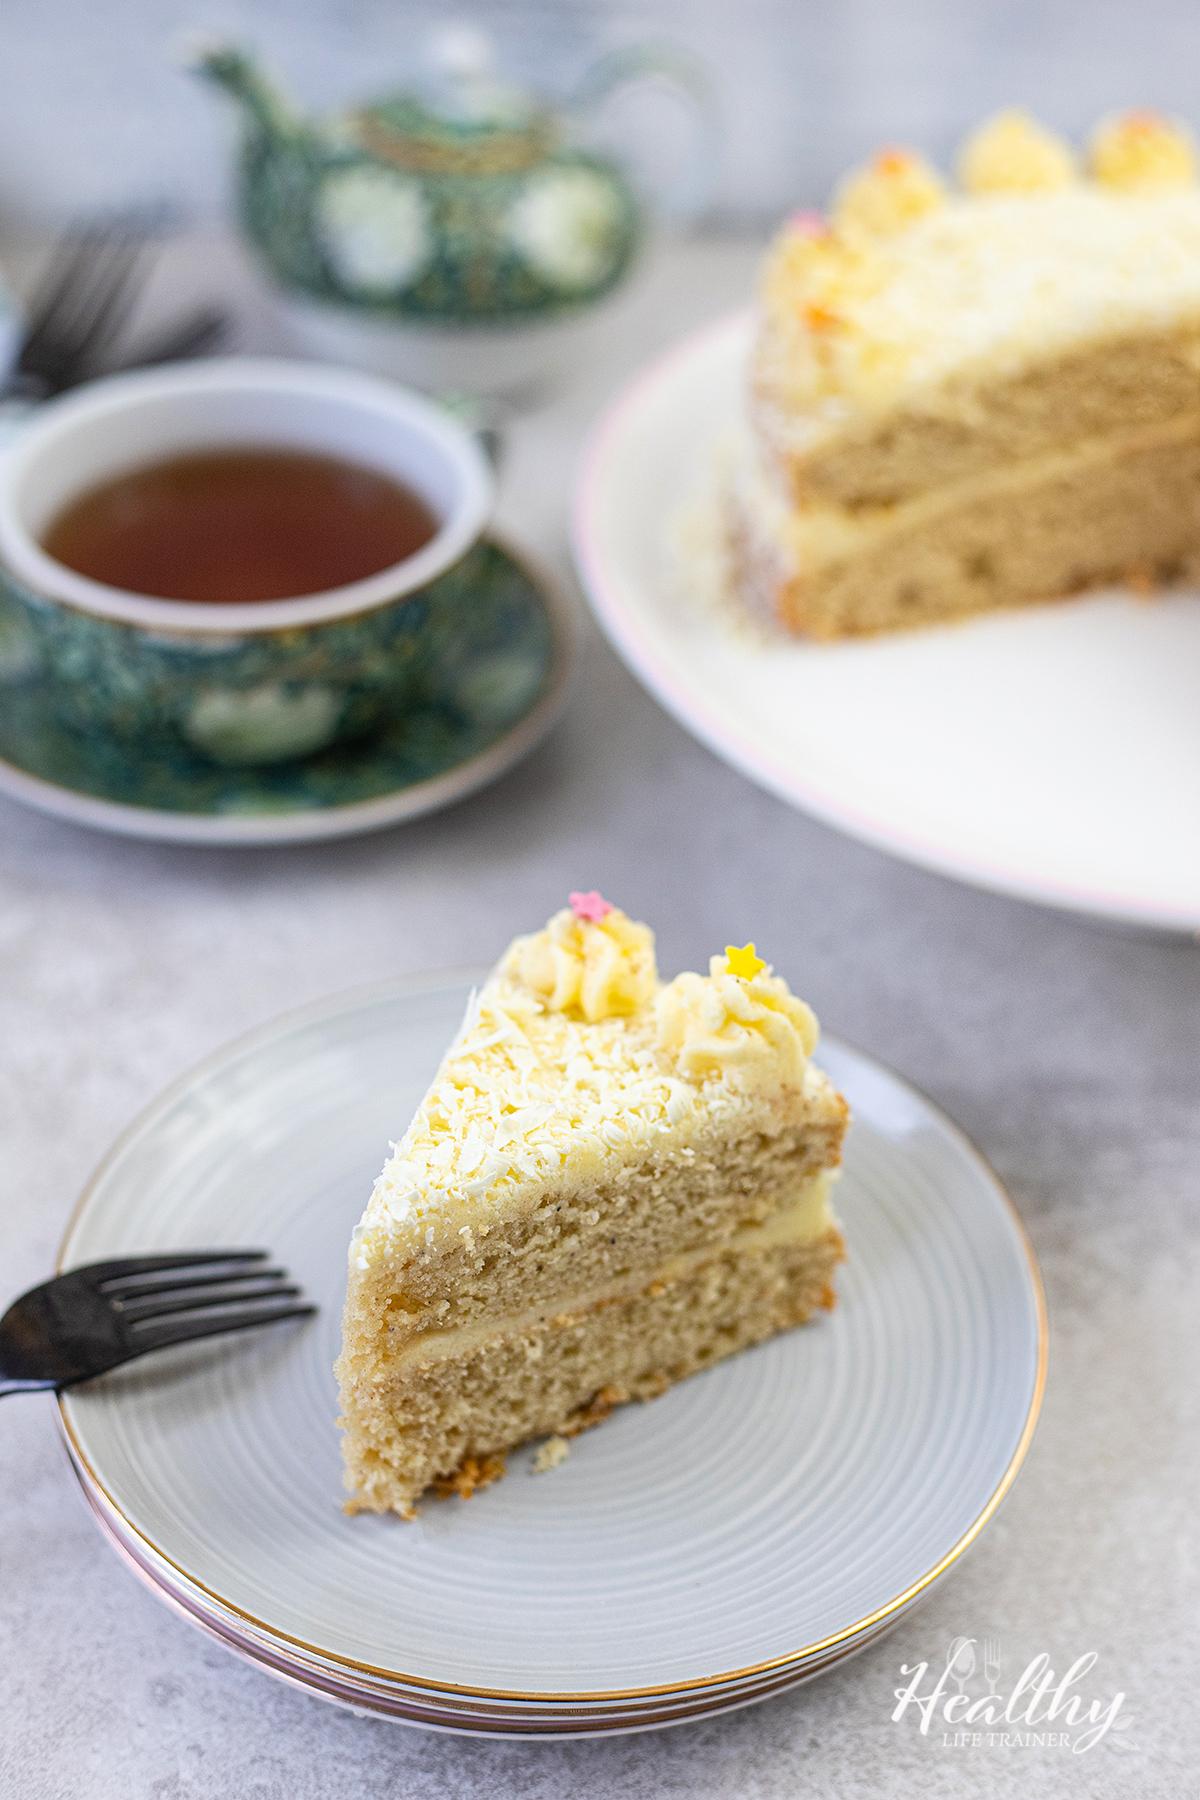 one slice of the cake on a serving plate #eggnogcake #easycake #christmascake #birthdaycake